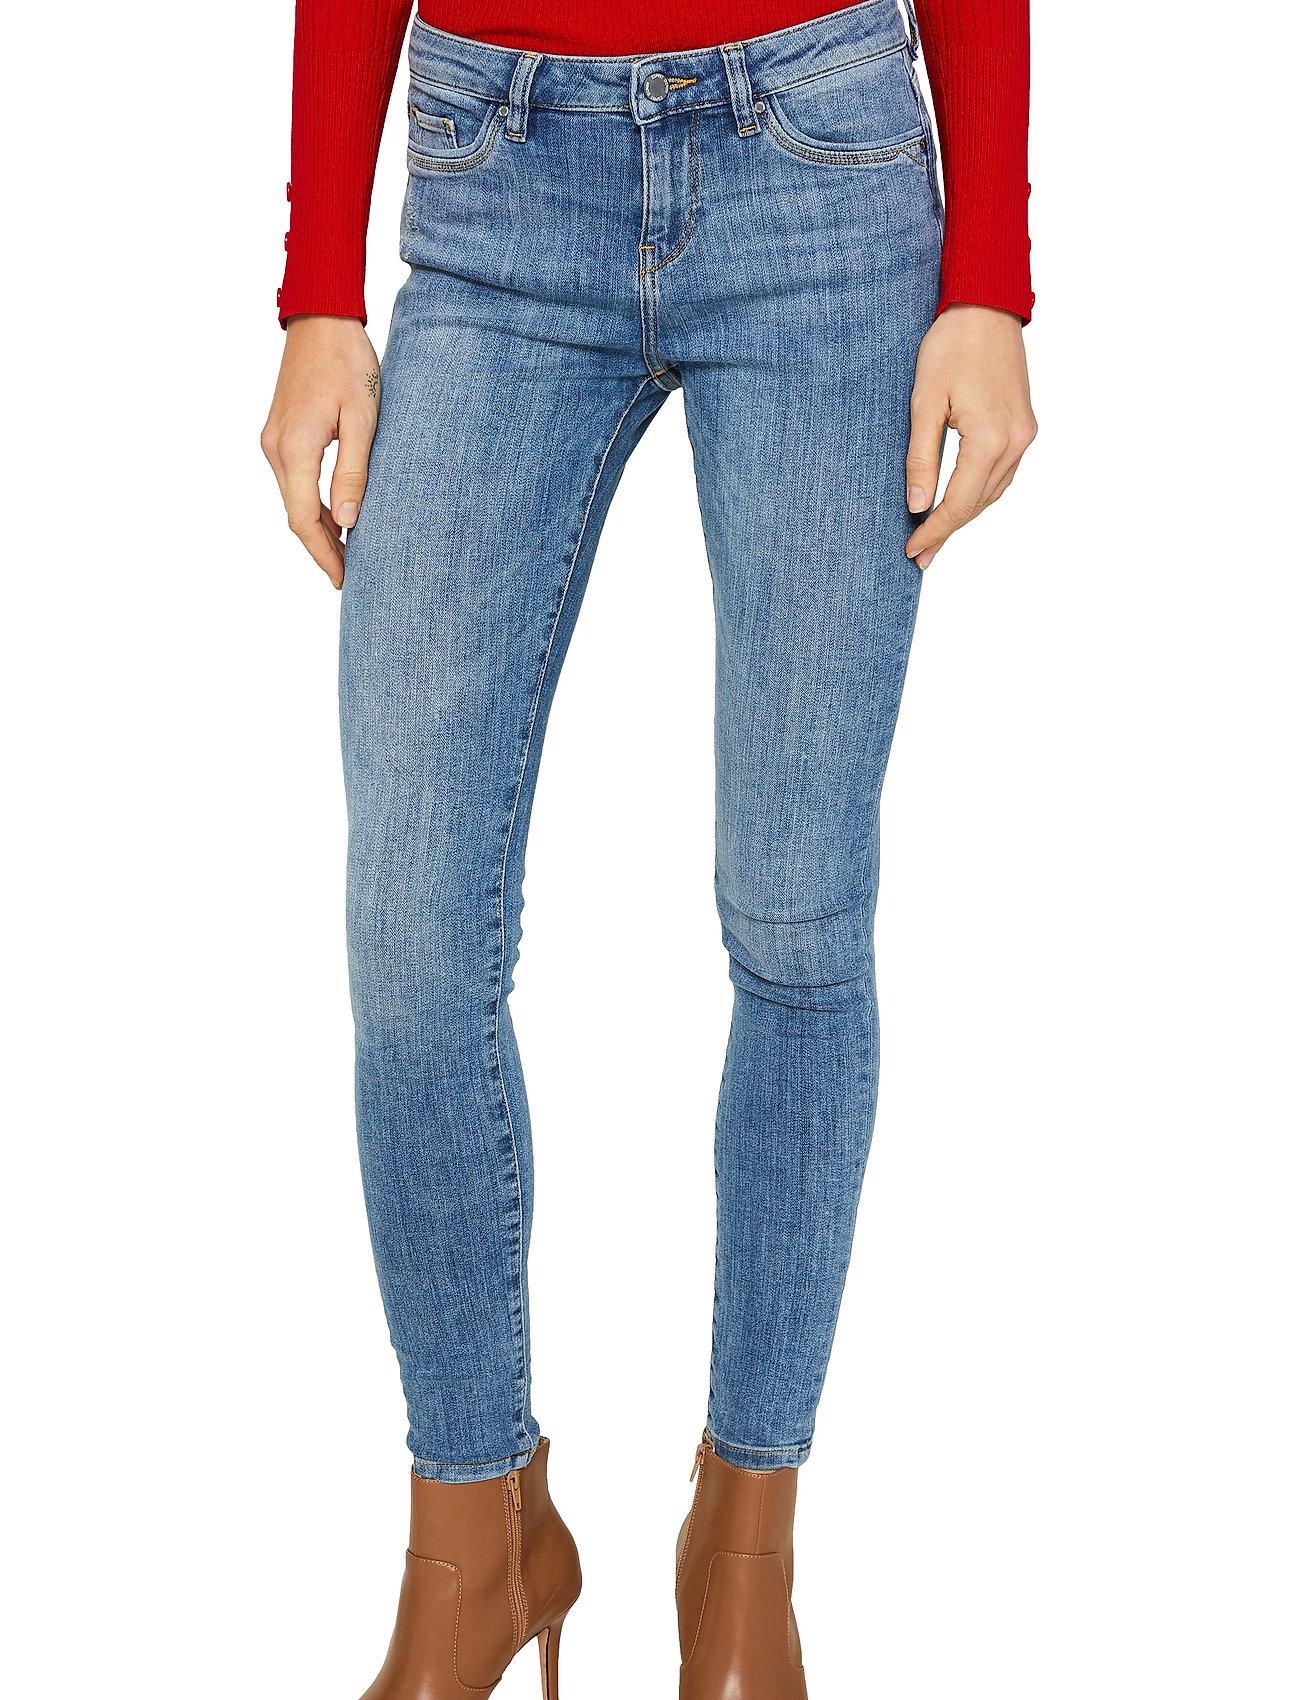 Esprit Casual - Pants denim - skinny jeans - blue light wash - 0